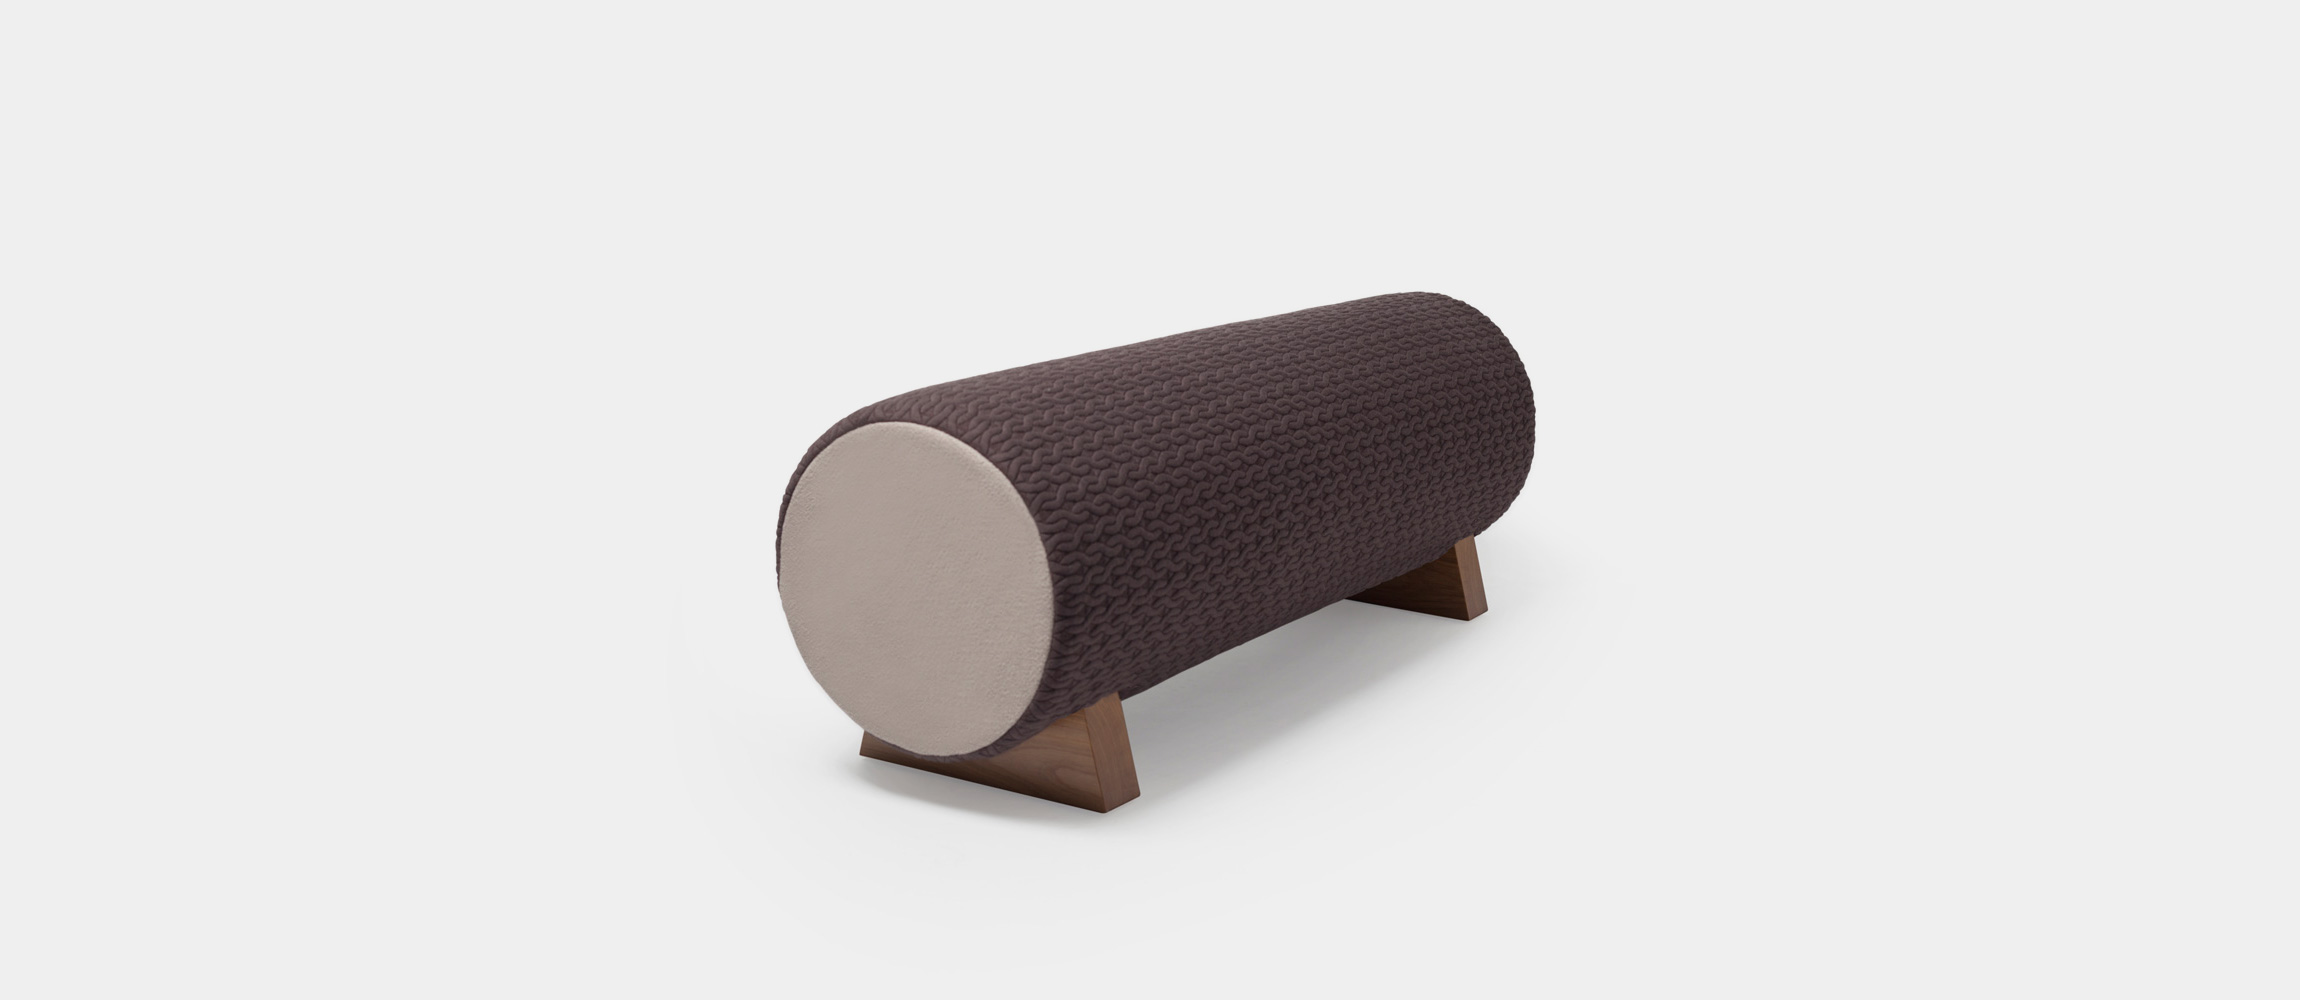 Bench-walnut-knit.jpg